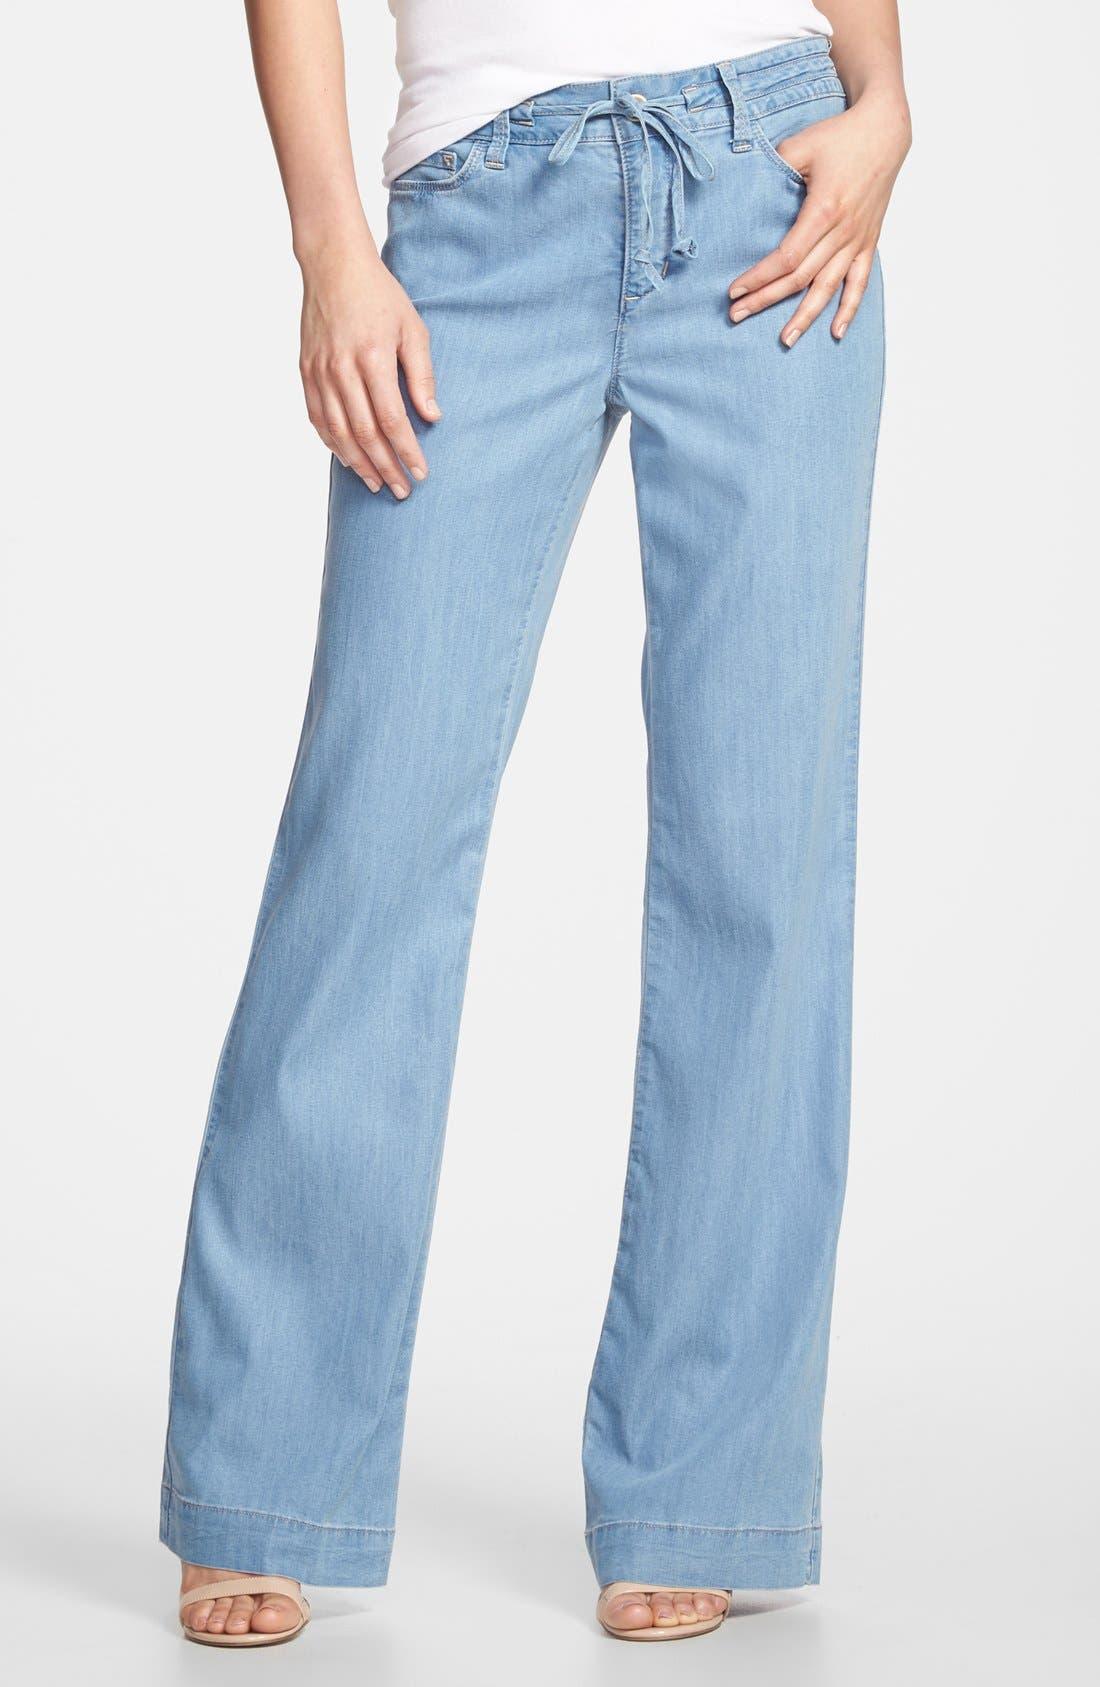 Alternate Image 1 Selected - NYDJ 'Lindsey' Wide Leg Pants (Regular & Petite)